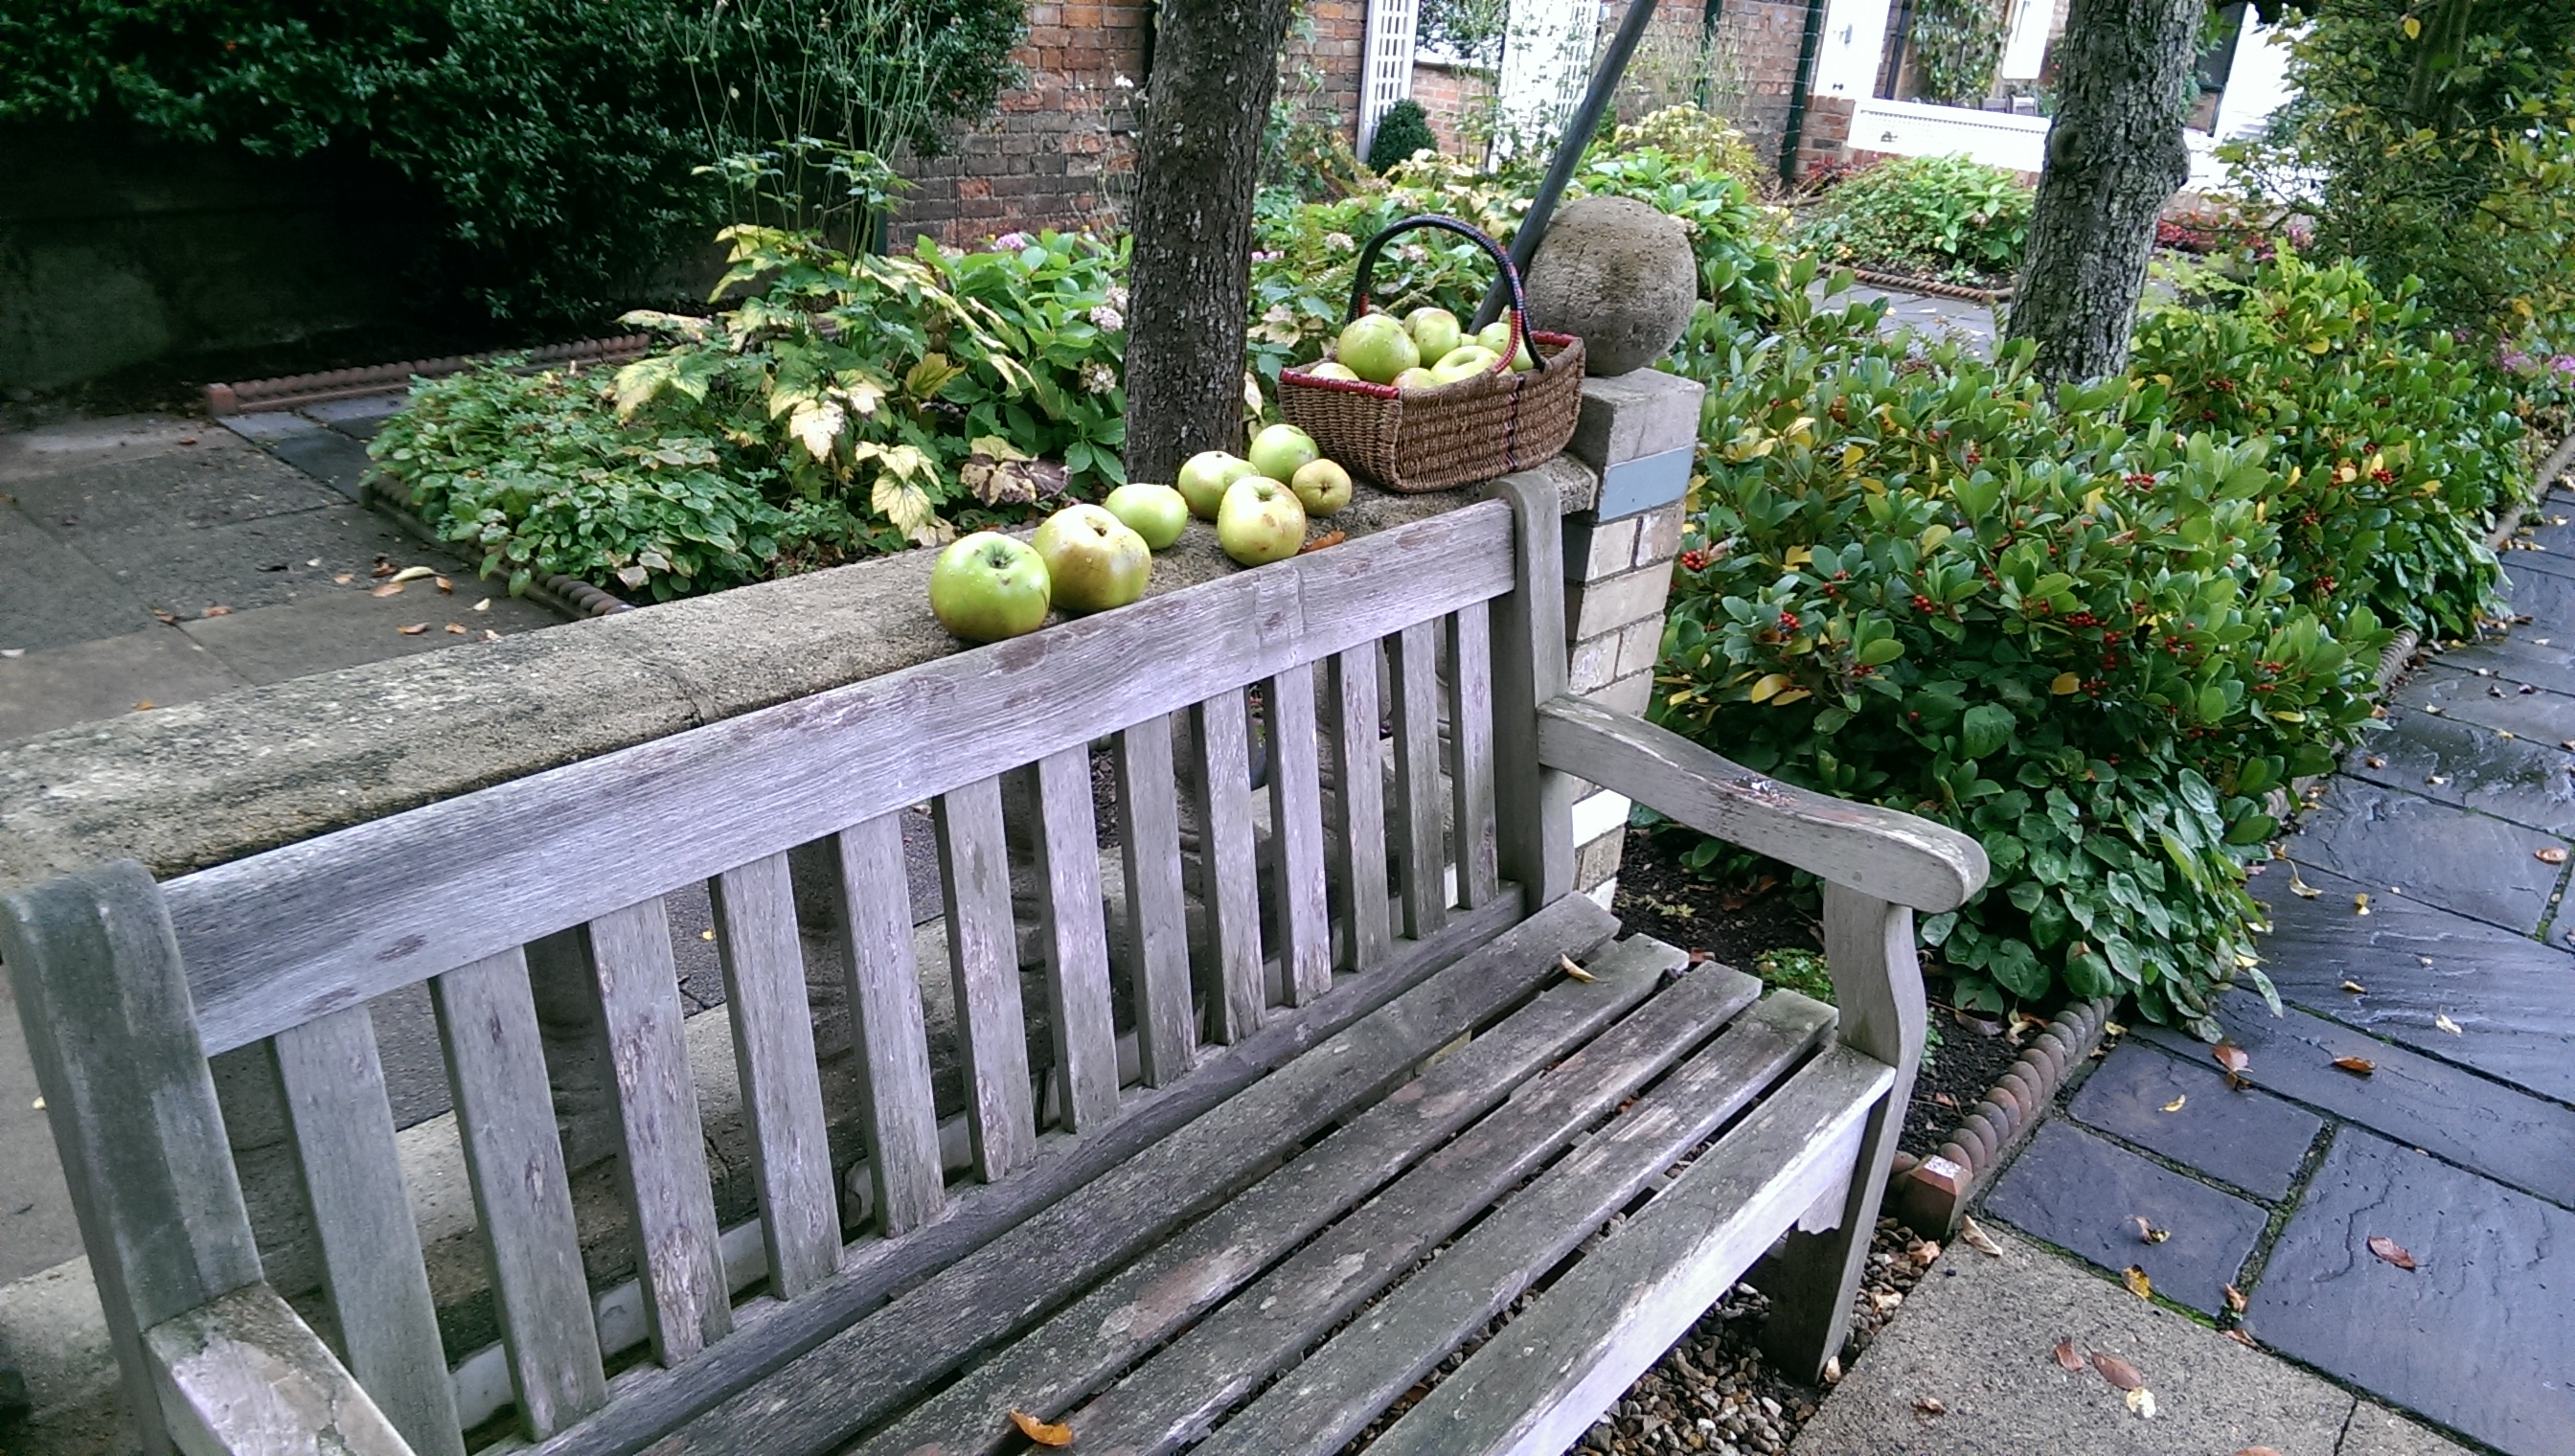 Panacea Society Museum Bedford Garden of Eden